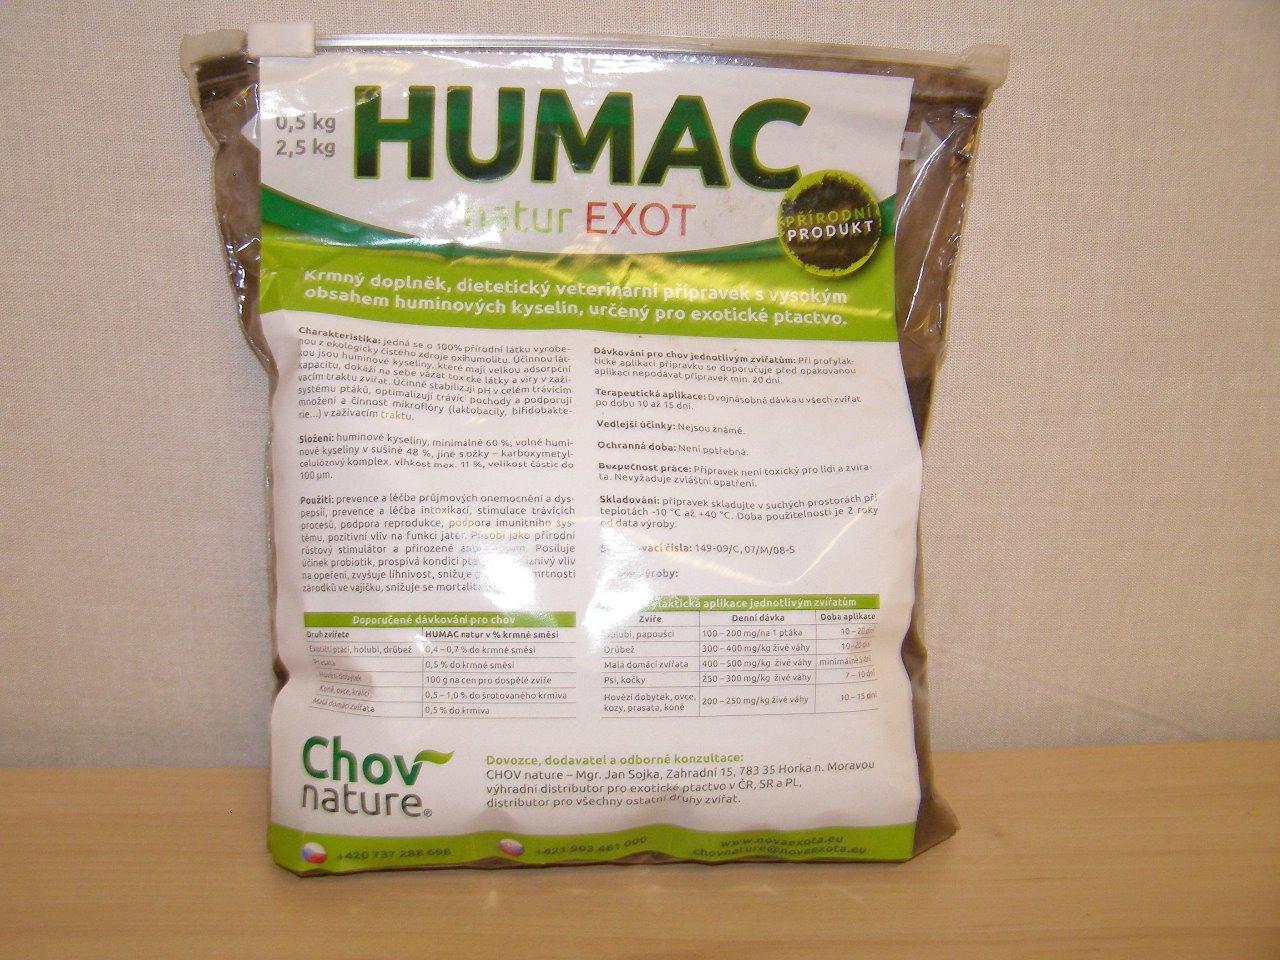 Chov nature Humac natur Exot 0,5 kg